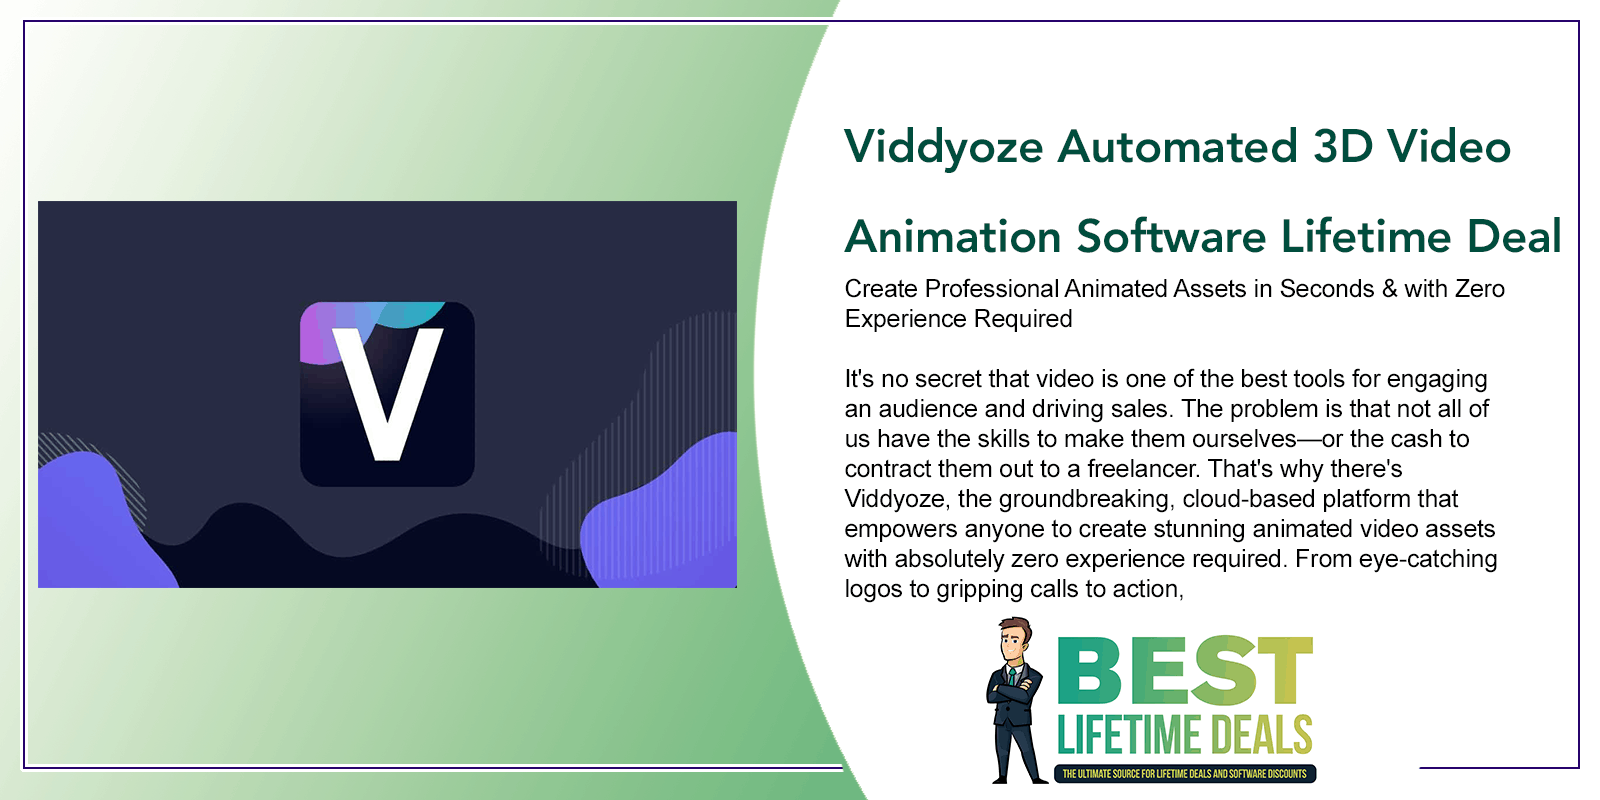 Viddyoze Automated 3D Video Animation Software Lifetime Deal Post Image